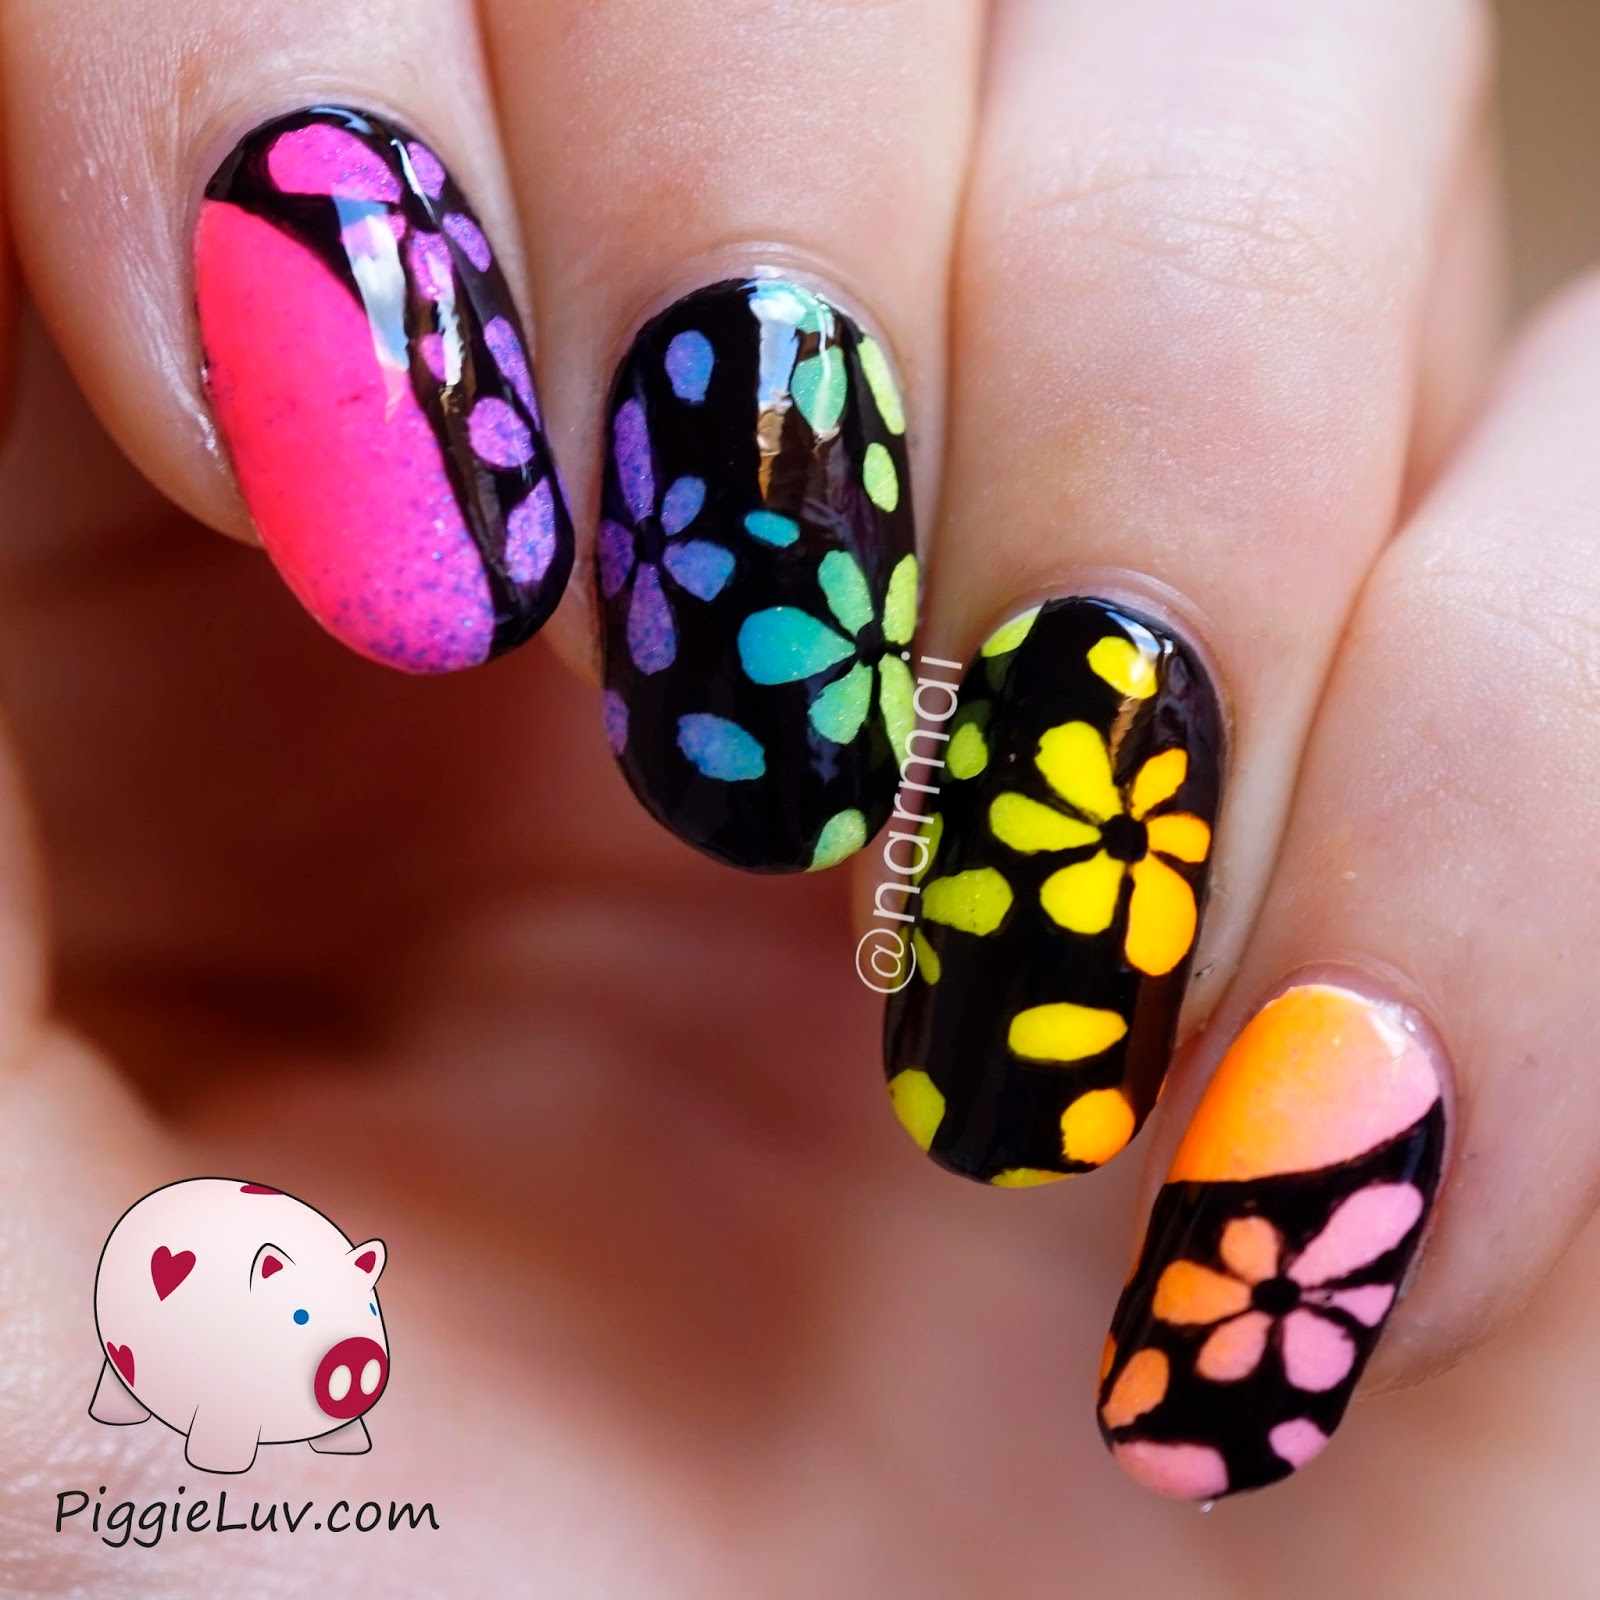 PiggieLuv: Inverse glow in the dark flowers nail art